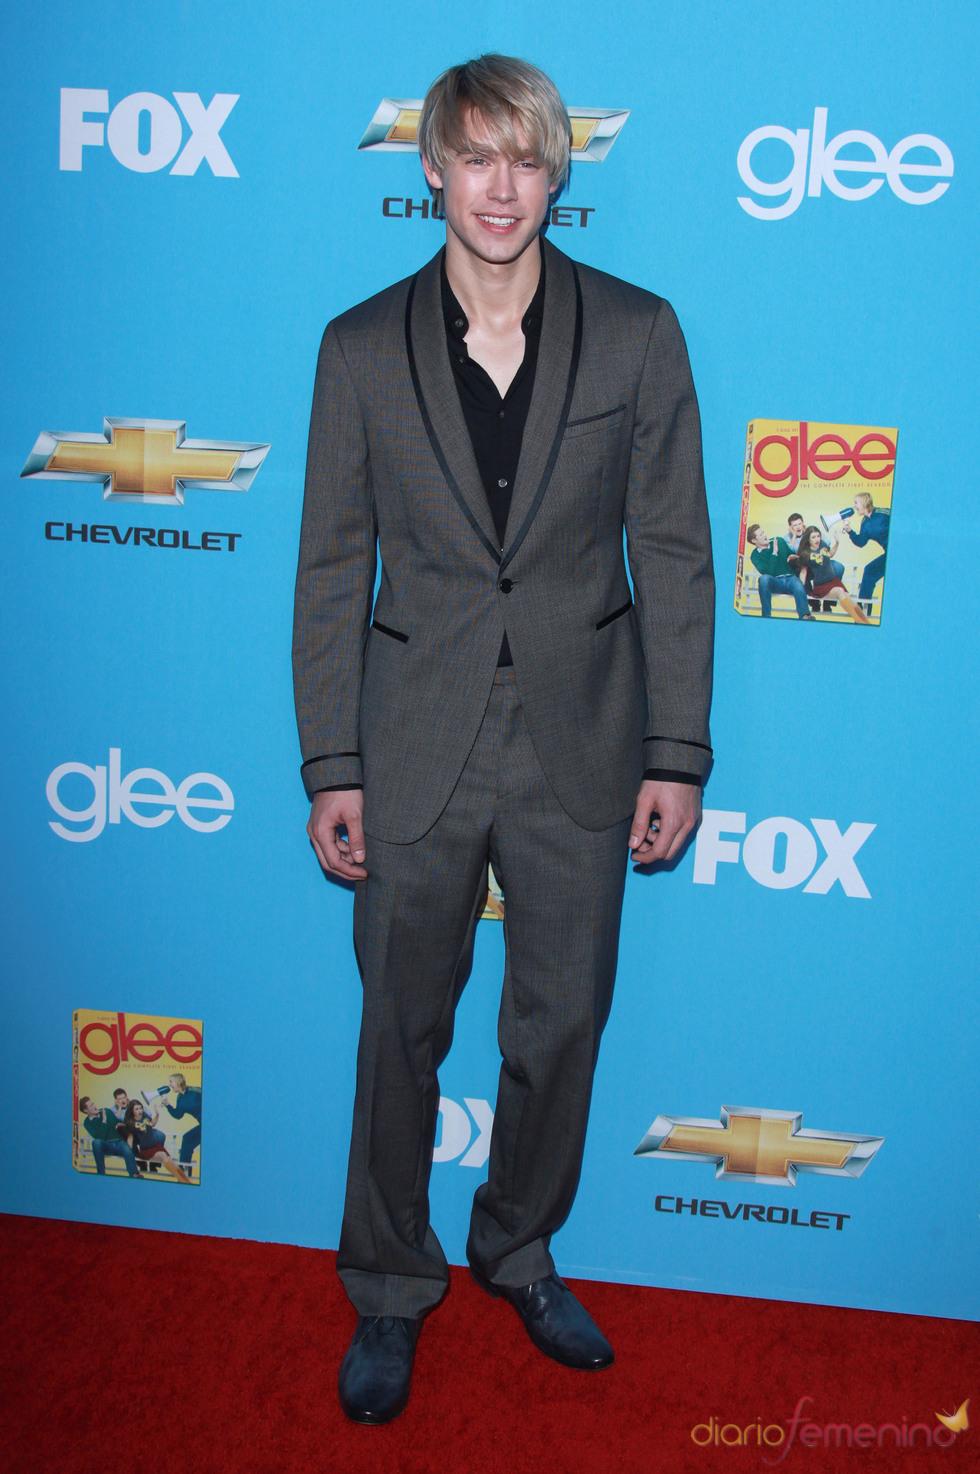 Chord Overstreet en el estreno de 'Glee'